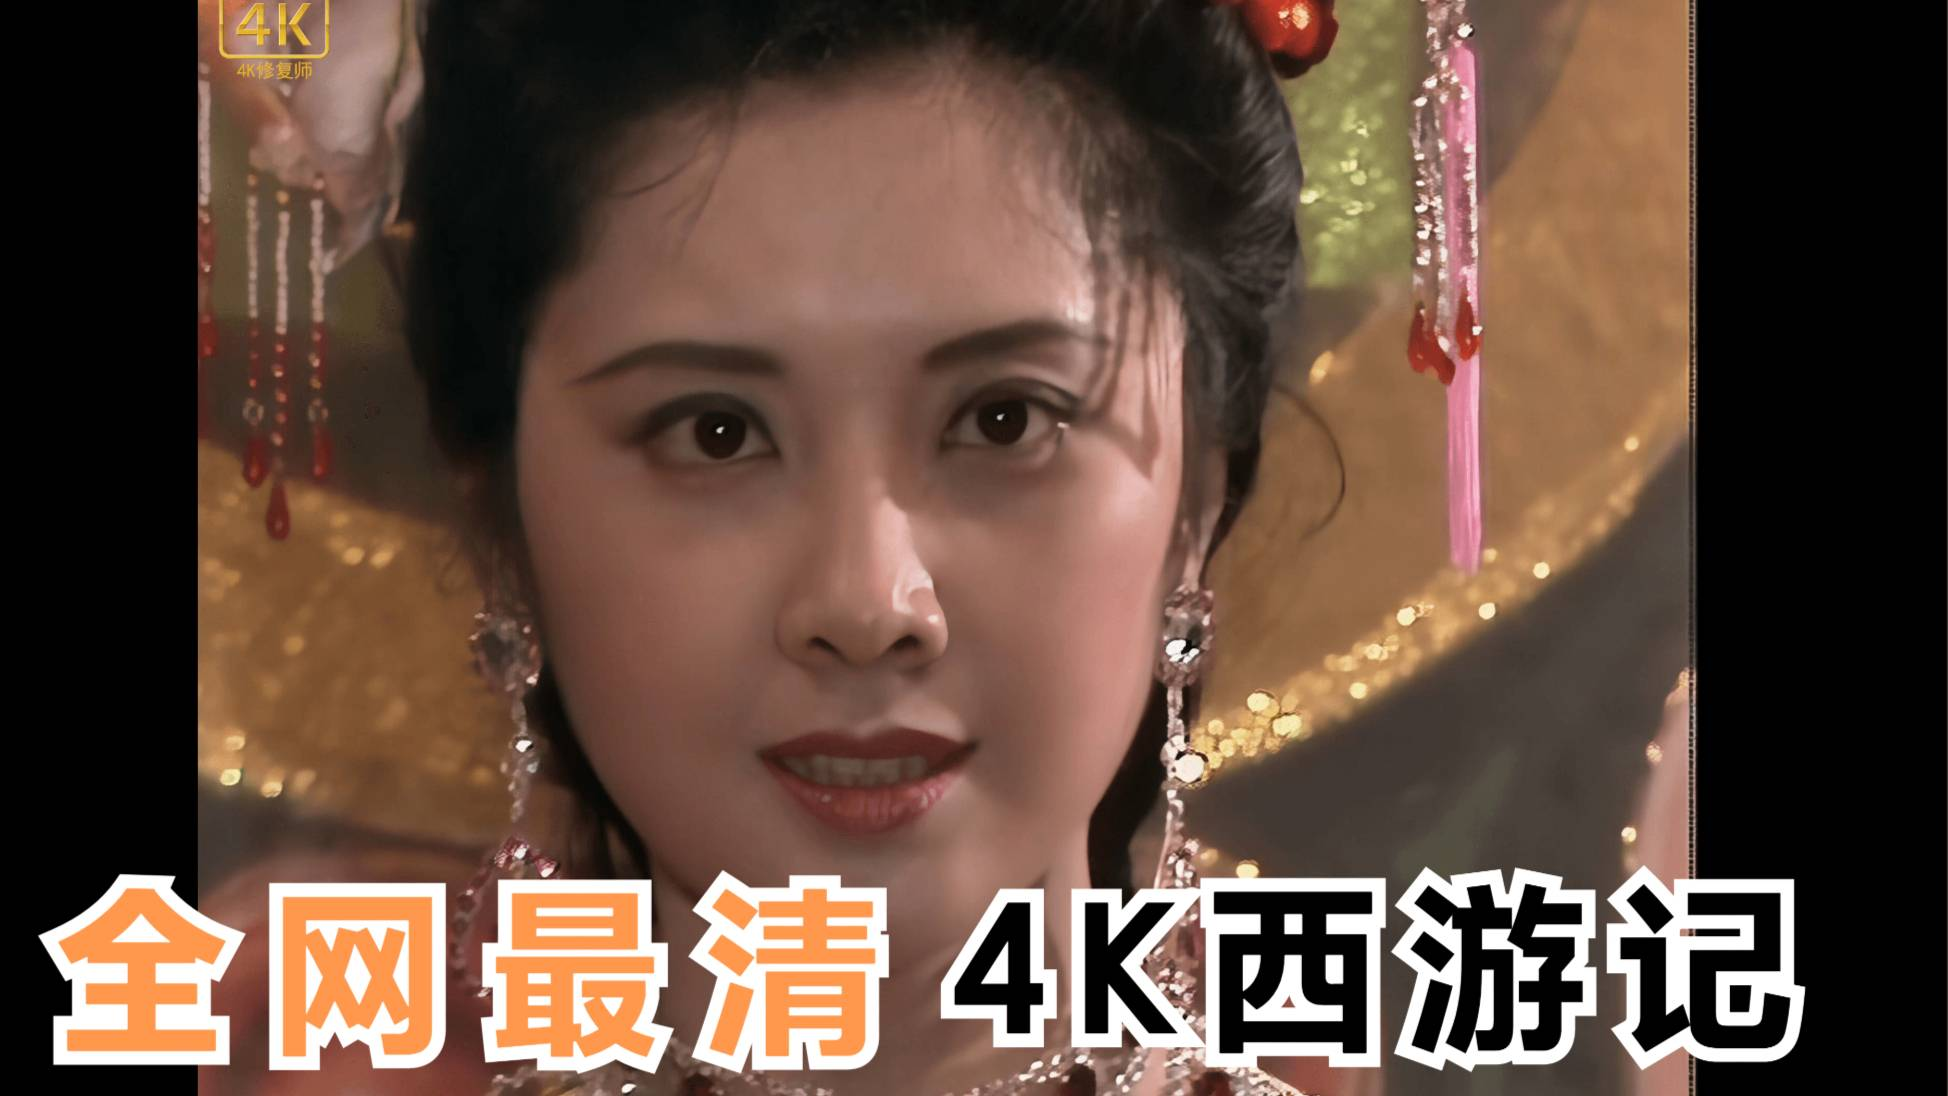 4K修复 86版西游记女儿国初见 无台标 无字幕 全网最清晰